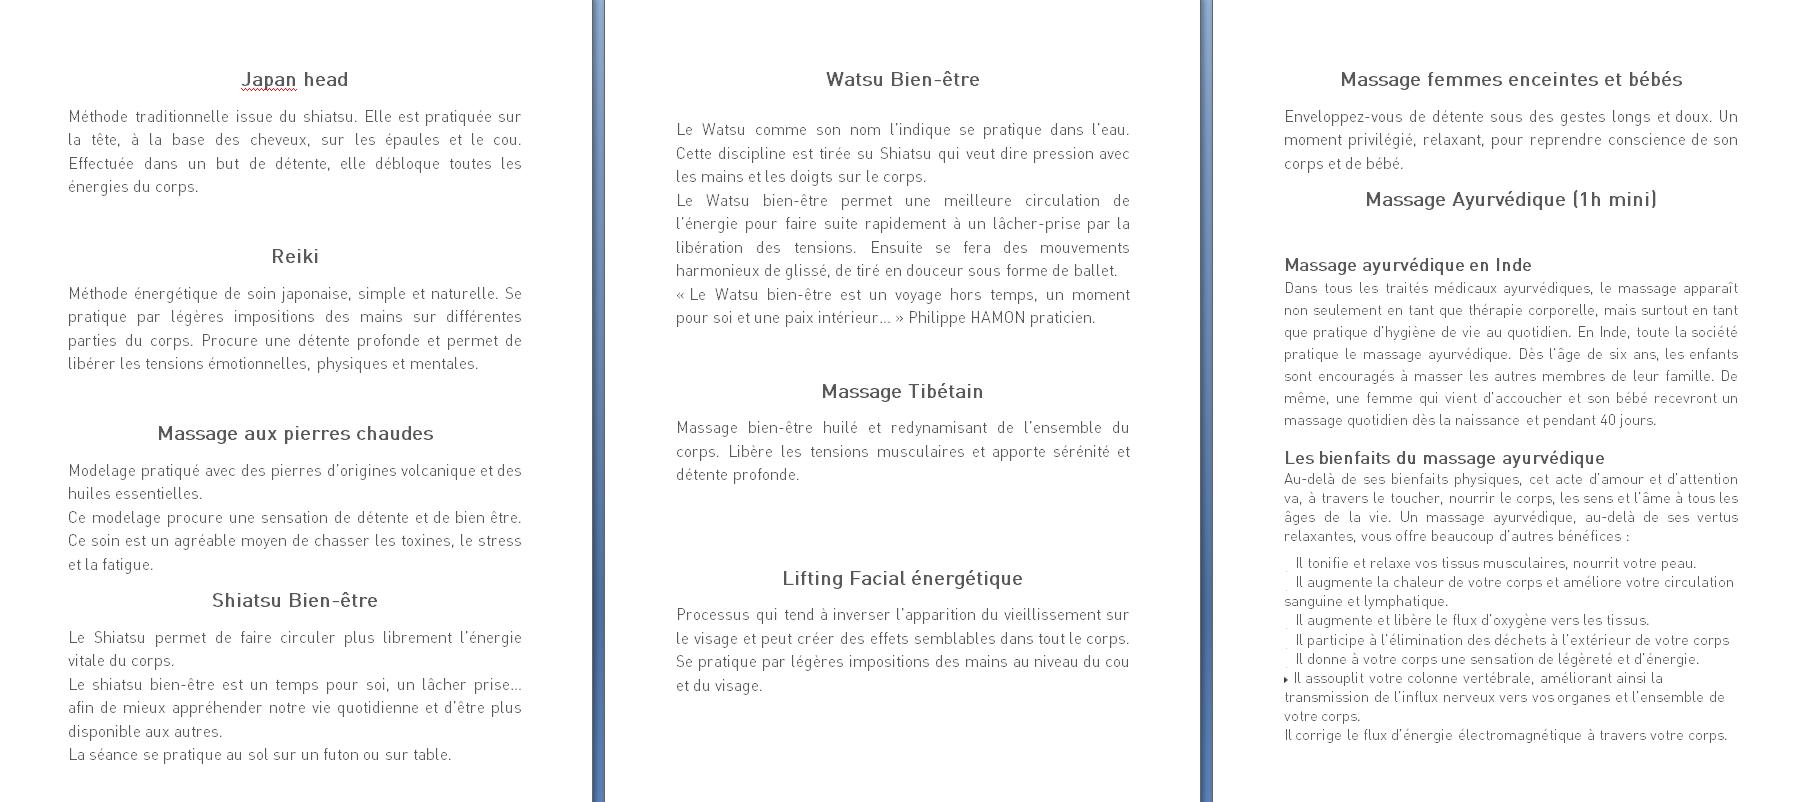 L'espace Aquatique Pays De Morlaix - Horaires Planning concernant Horaire Piscine Morlaix